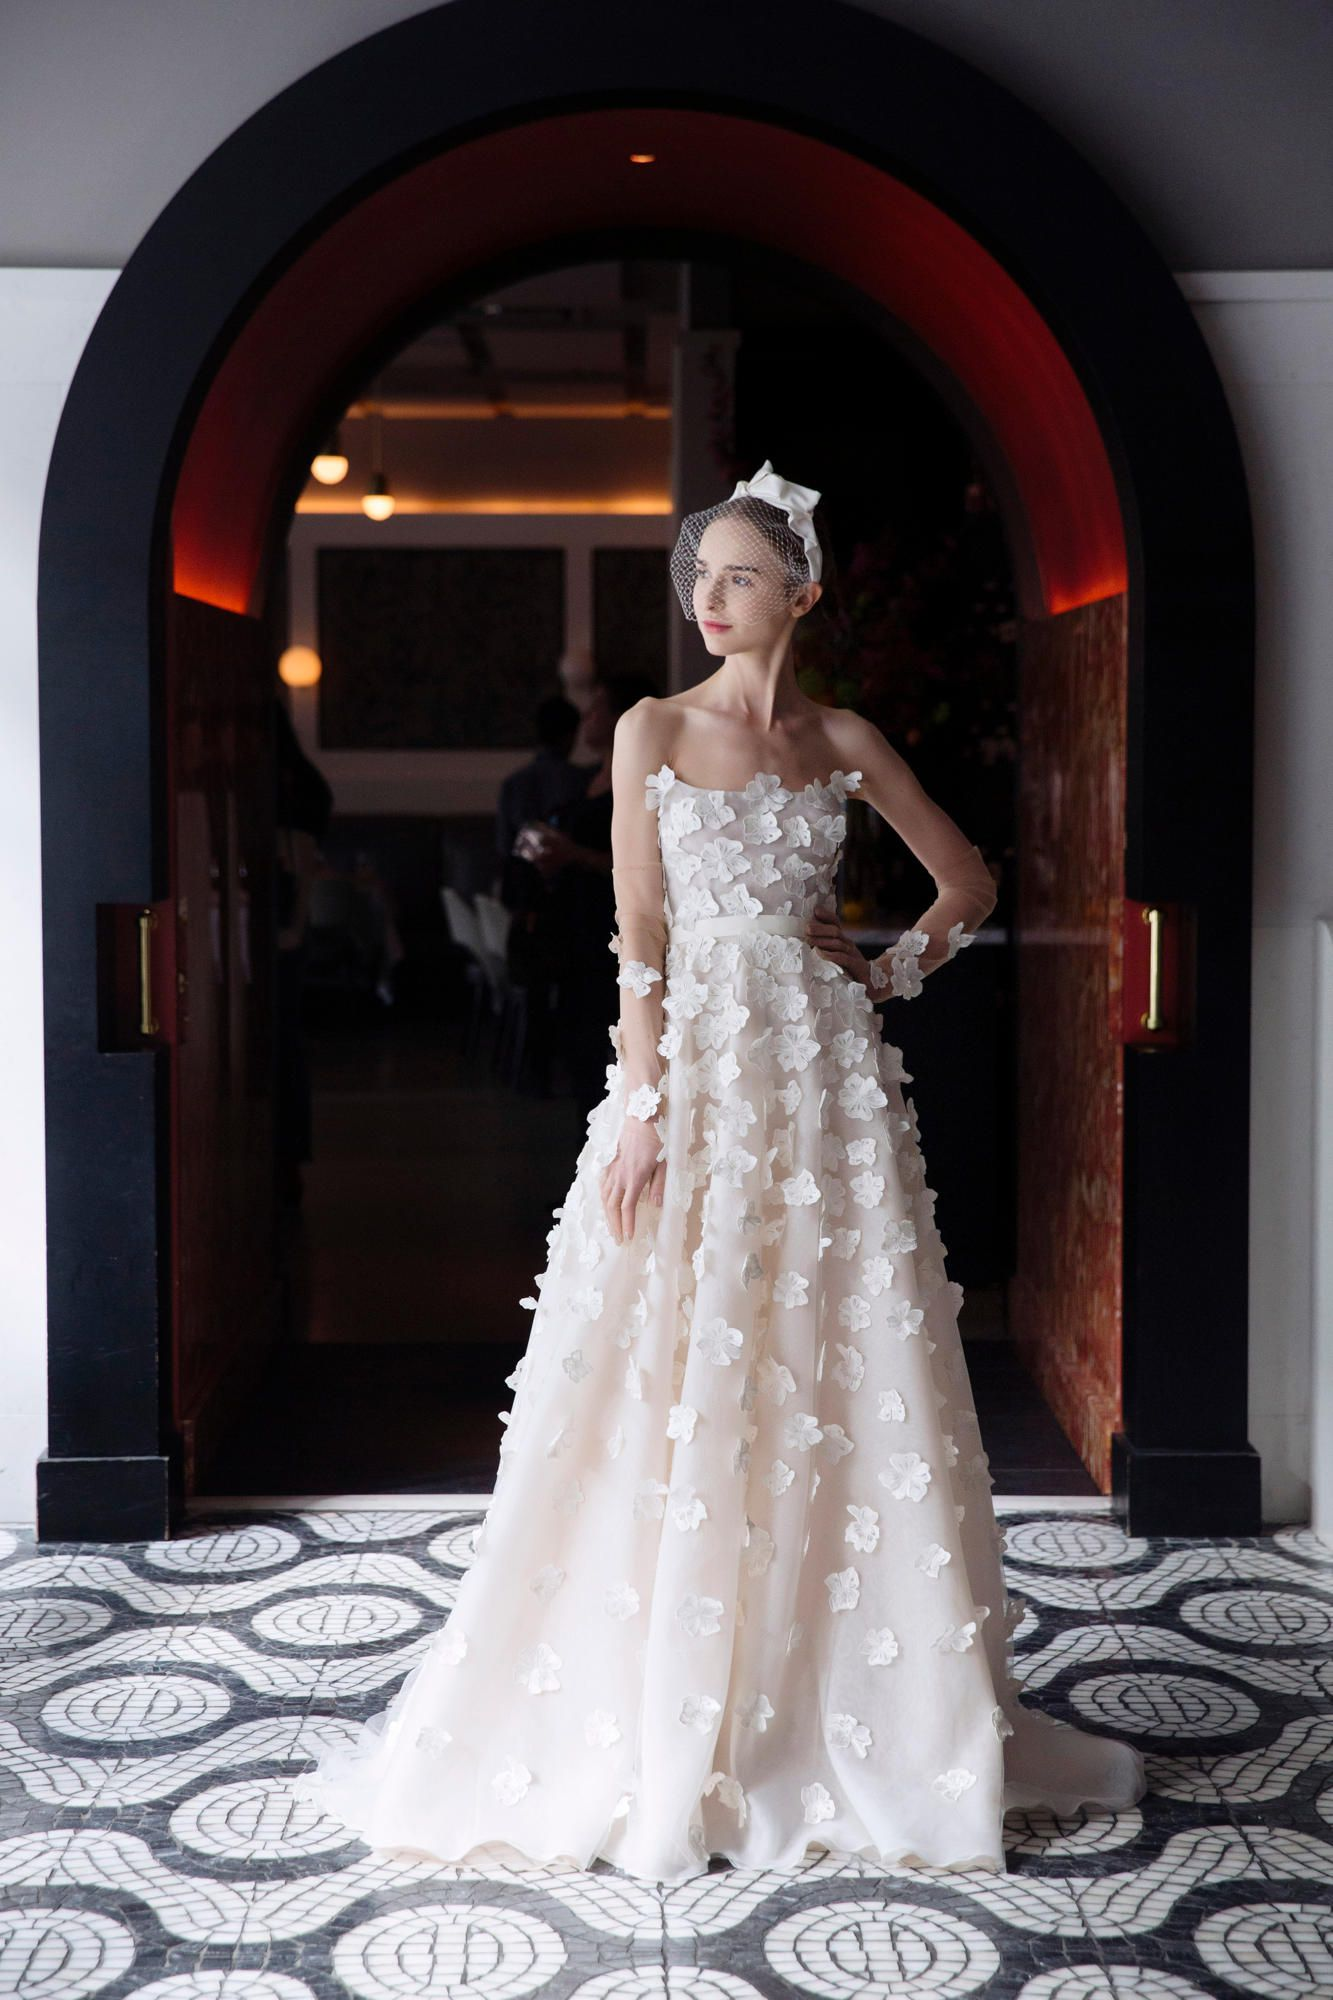 lela-rose-spring-2018-bridal-pink-gown Tendências de vestidos de noiva para 2018